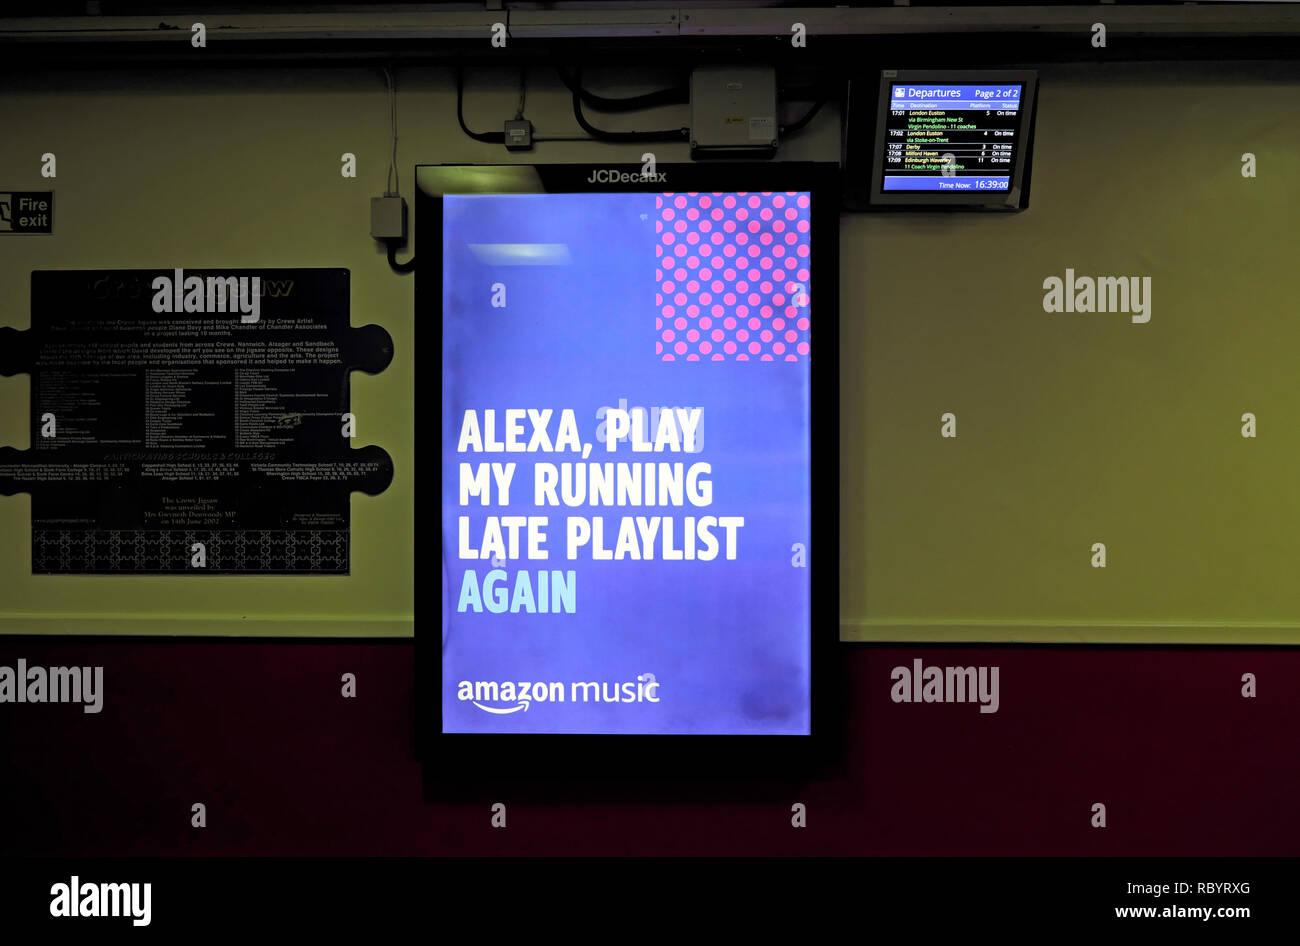 Alexa Play My Running Late Playlist Again